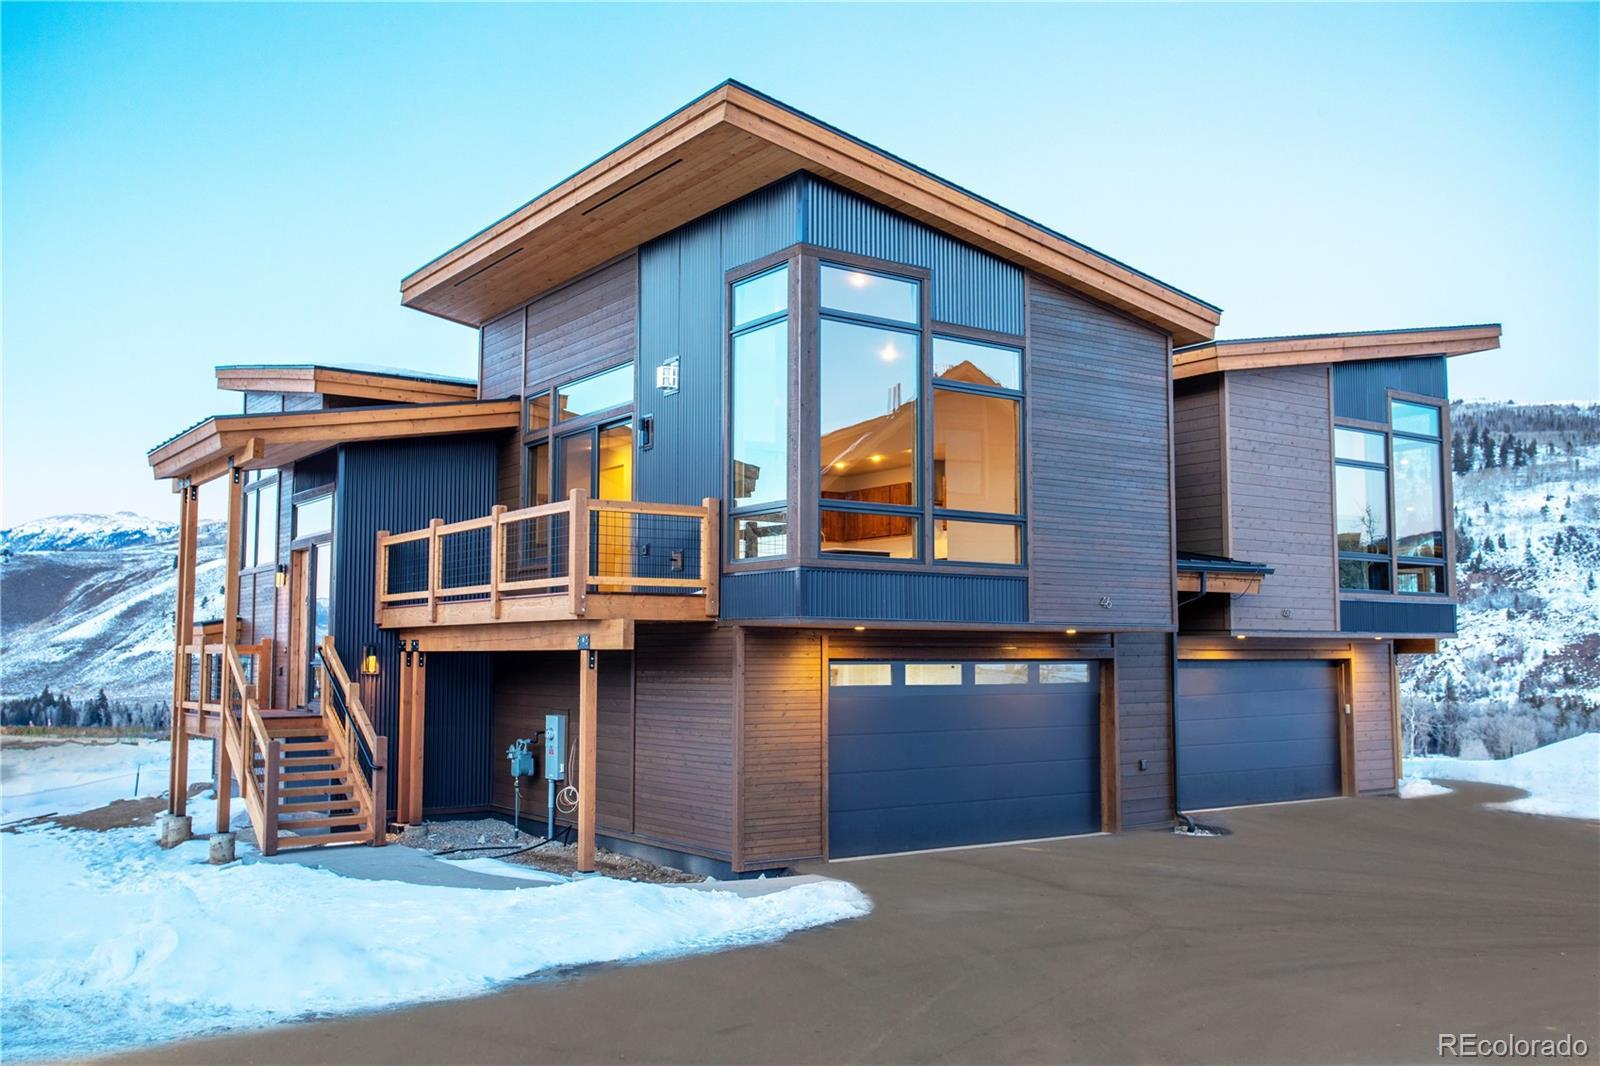 46 W Baron Way, Silverthorne, CO 80498 - Silverthorne, CO real estate listing